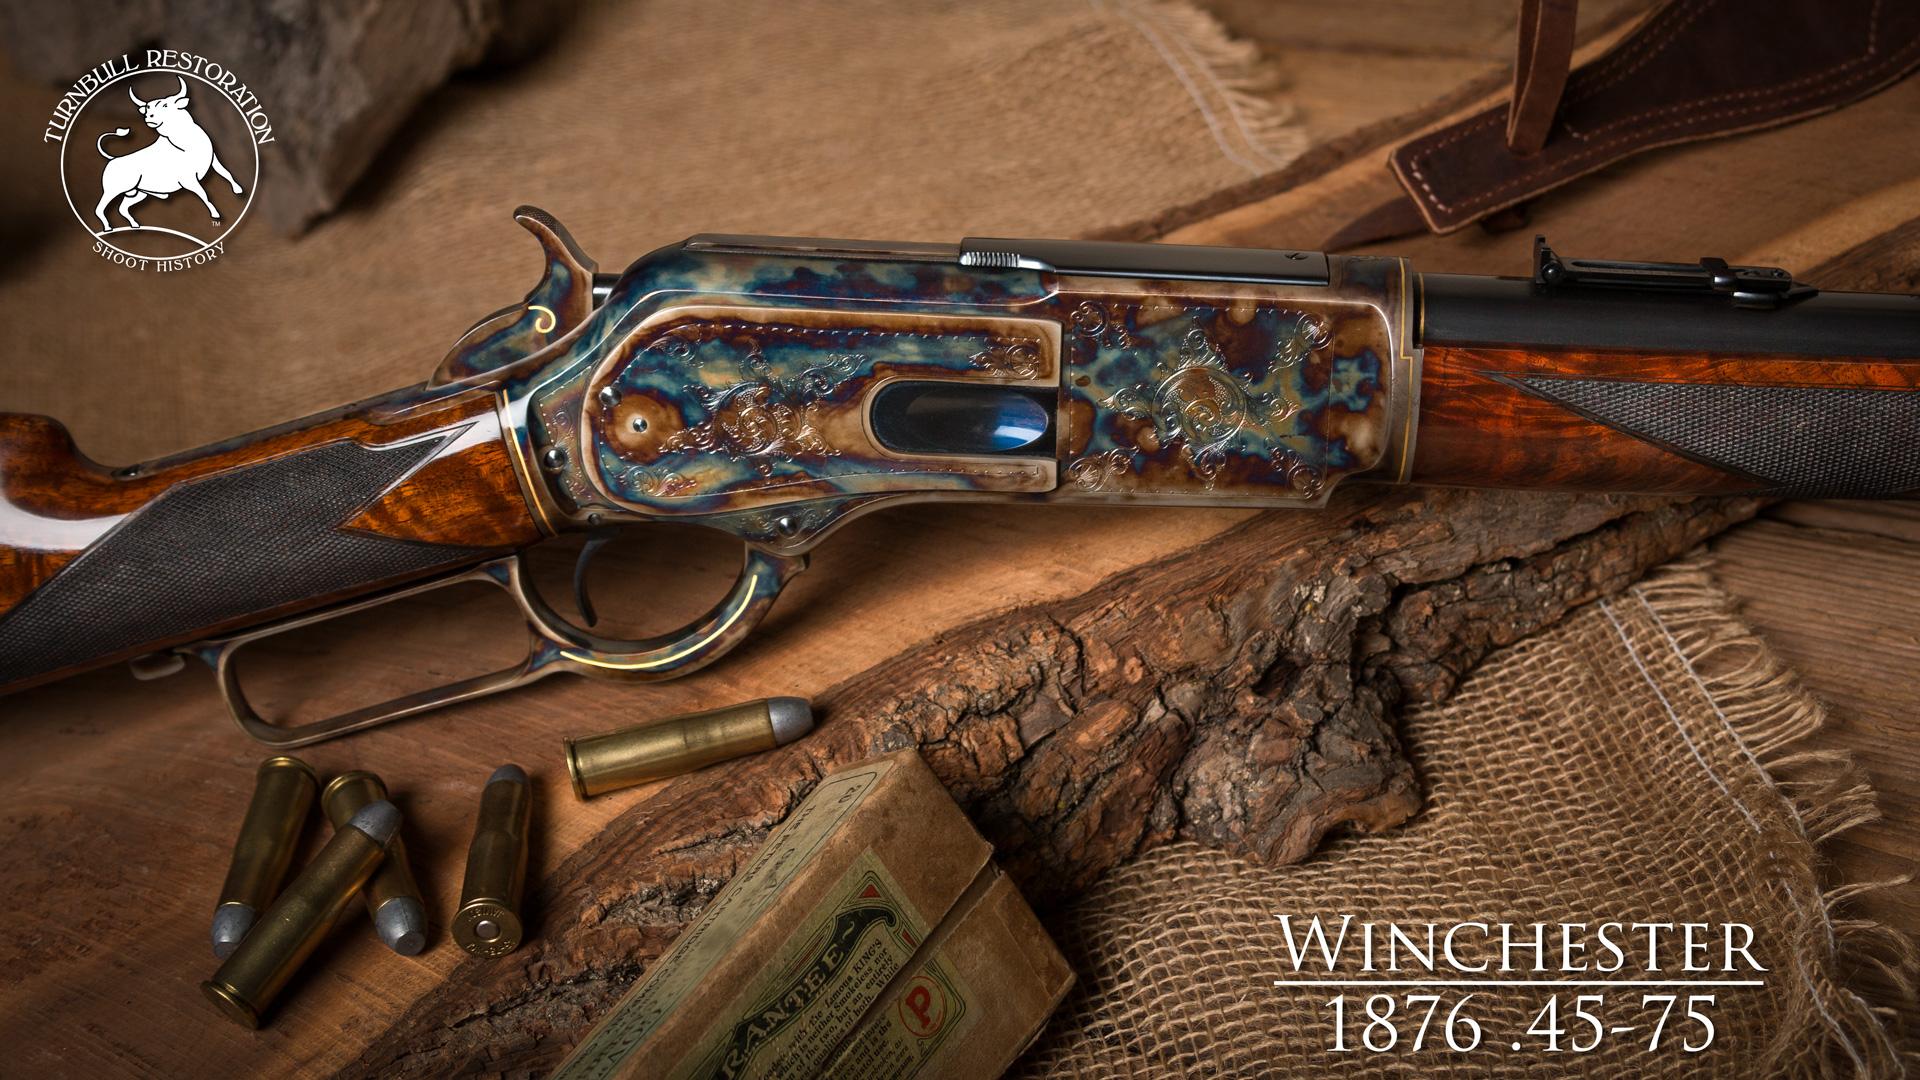 Lovačko oružje i municija - Page 5 2C-Winchester-1876-38272-Glam_IMG_9480-finished-branded